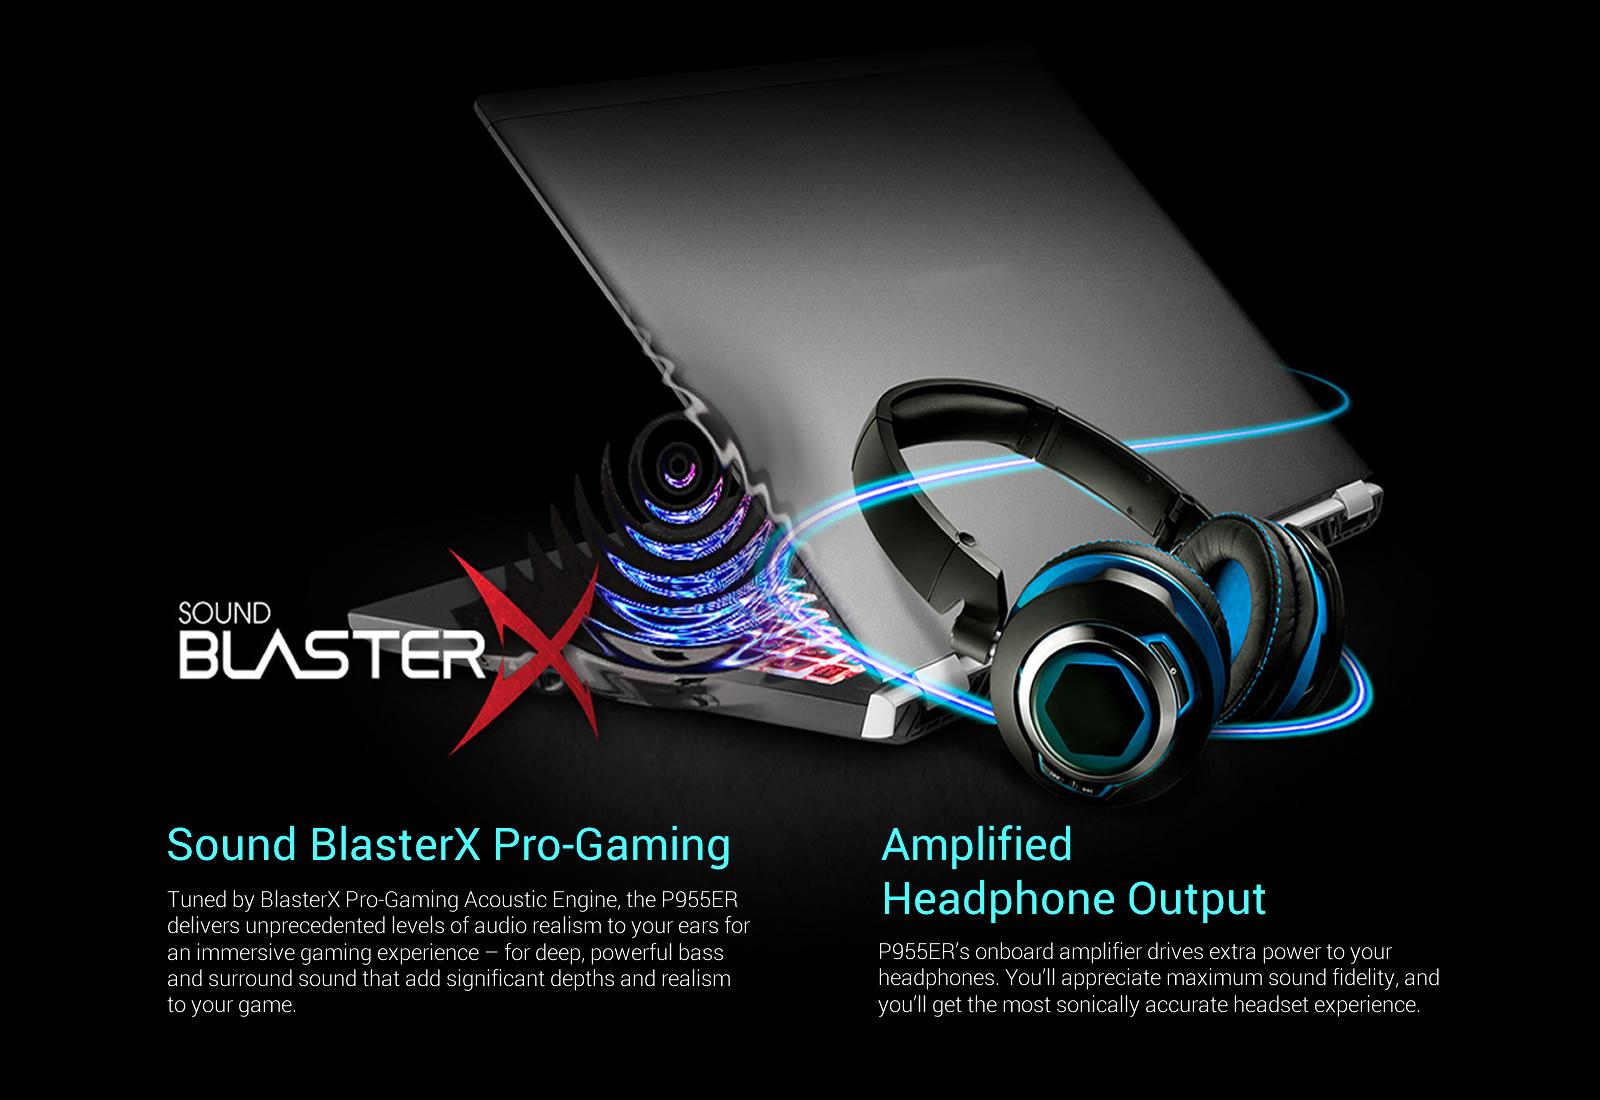 Clevo P955er 156 Core I7 Gtx 1070 Gaming Laptop Avadirect Fs Razer Kraken Pro V2 Black Cpu